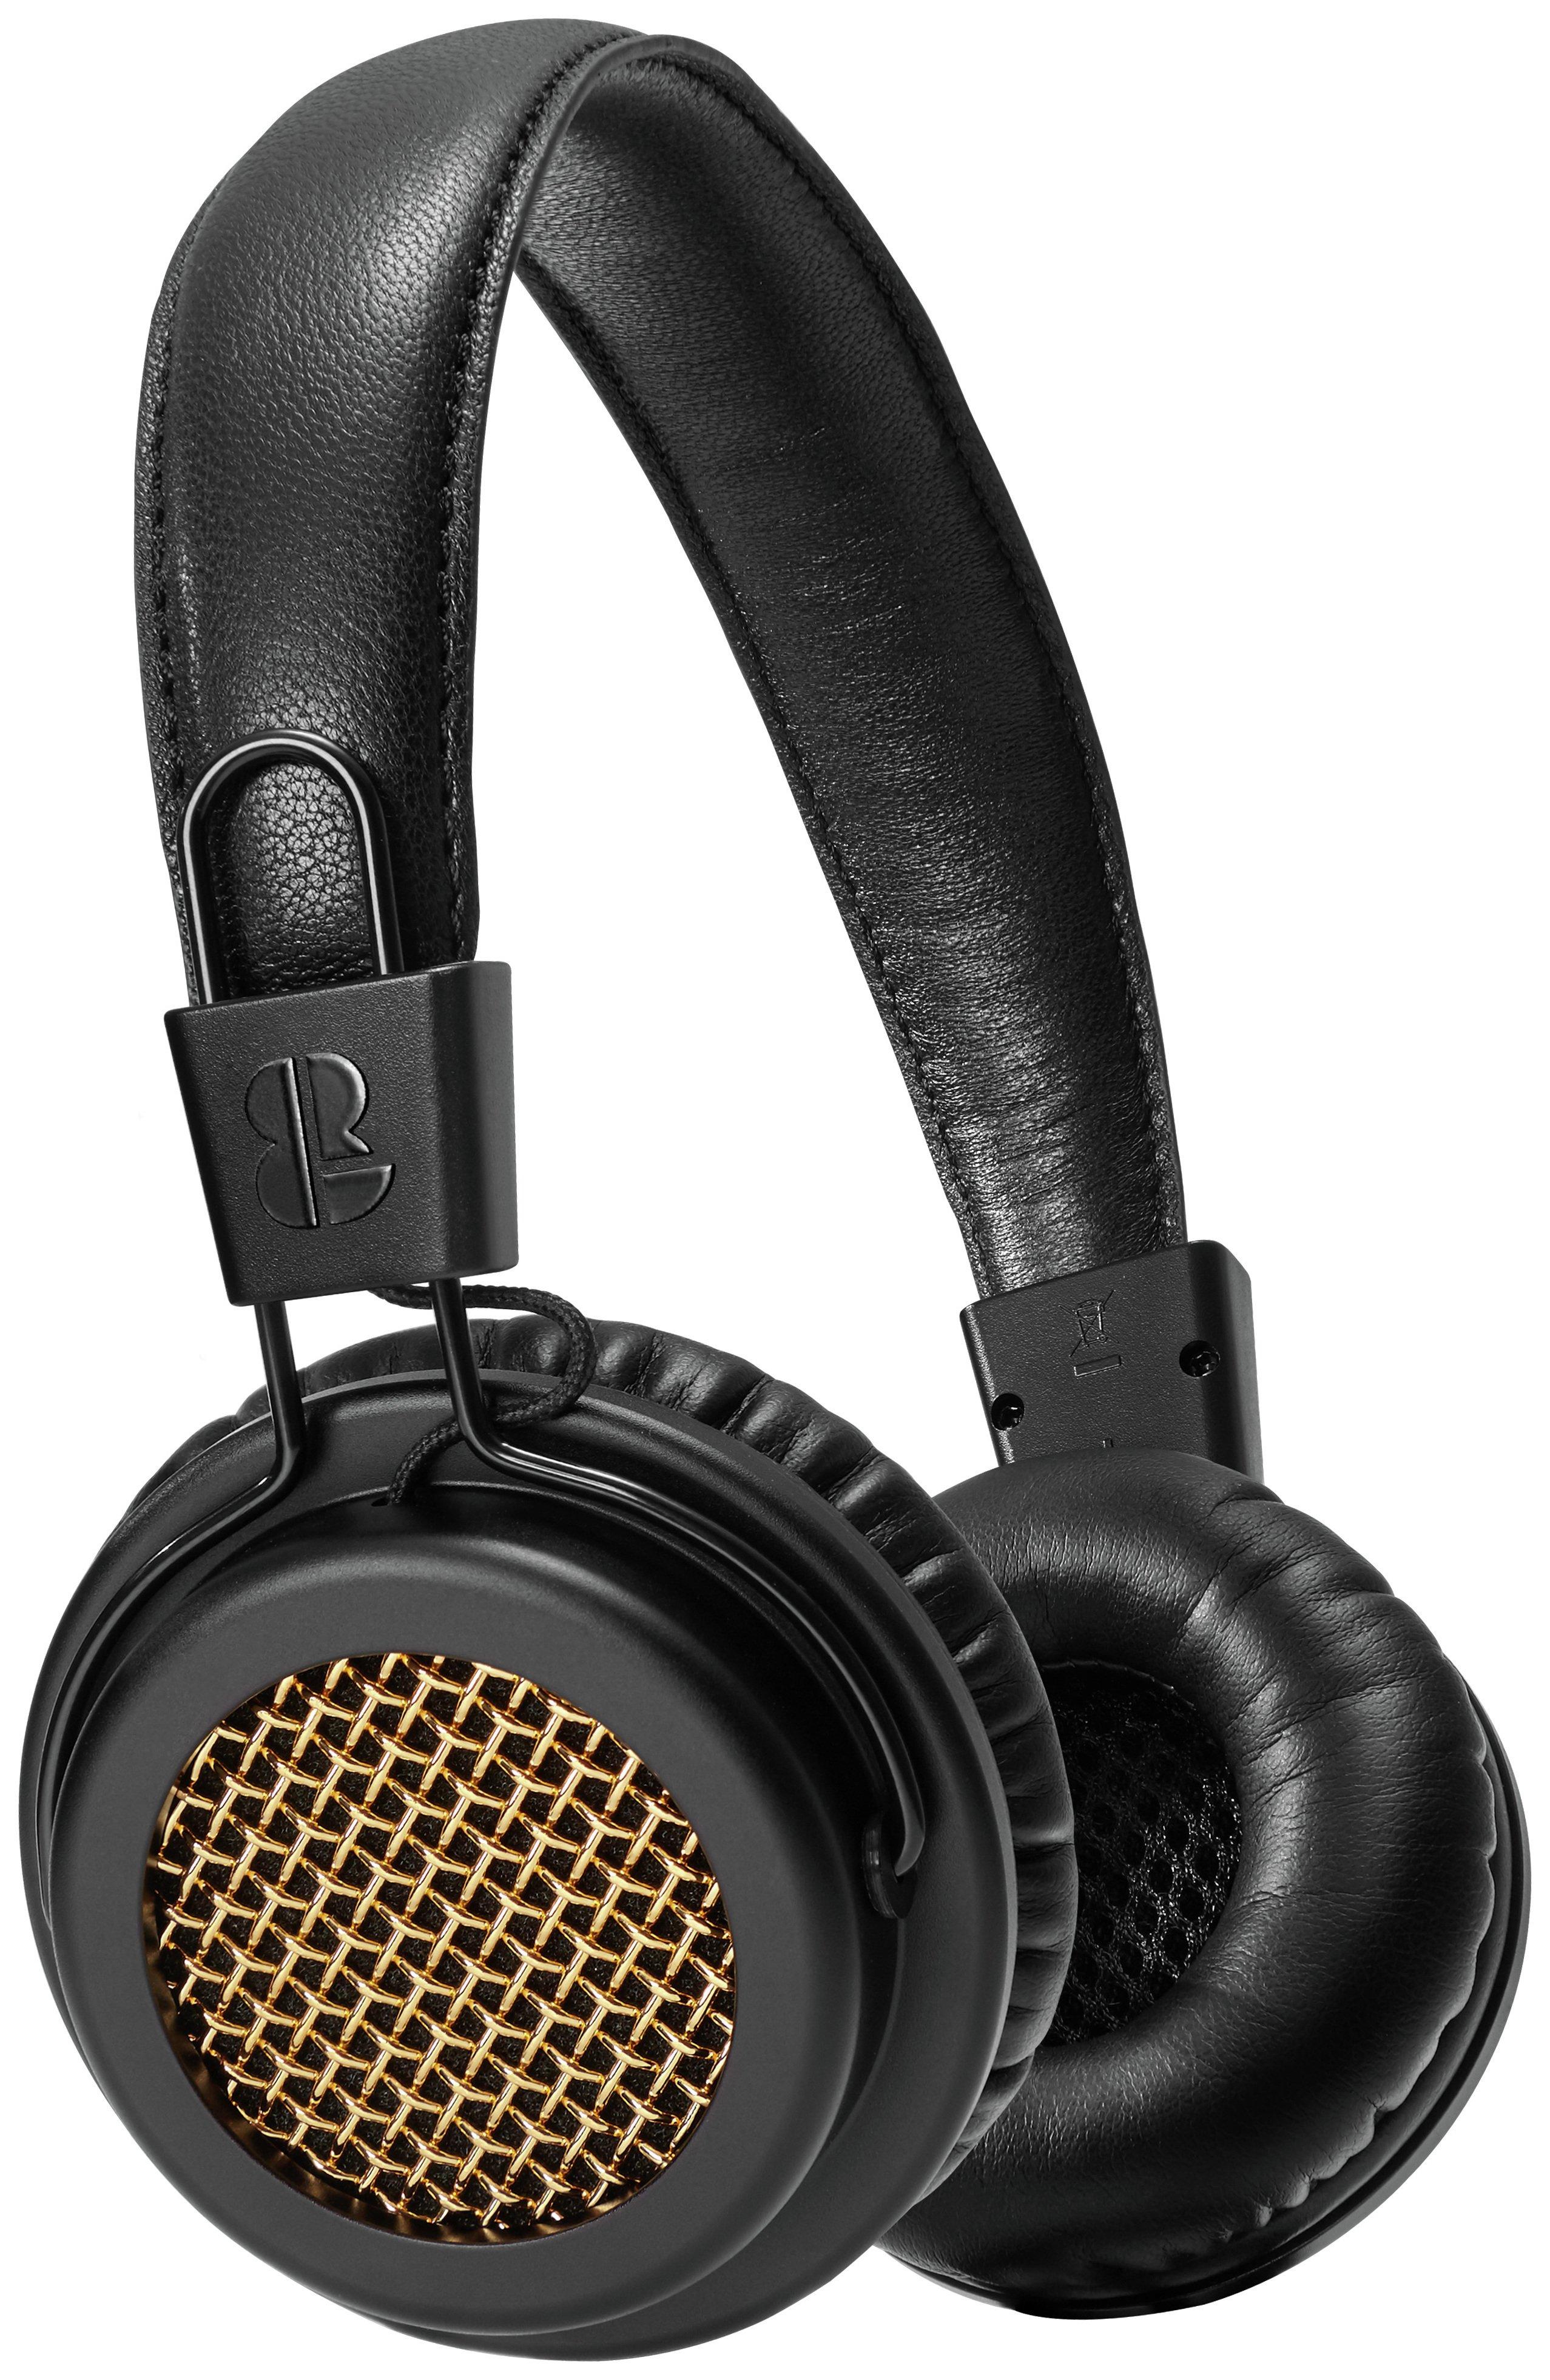 Image of BLOC & ROC - Galvanize S2 On Ear Headphones - Black/Gold